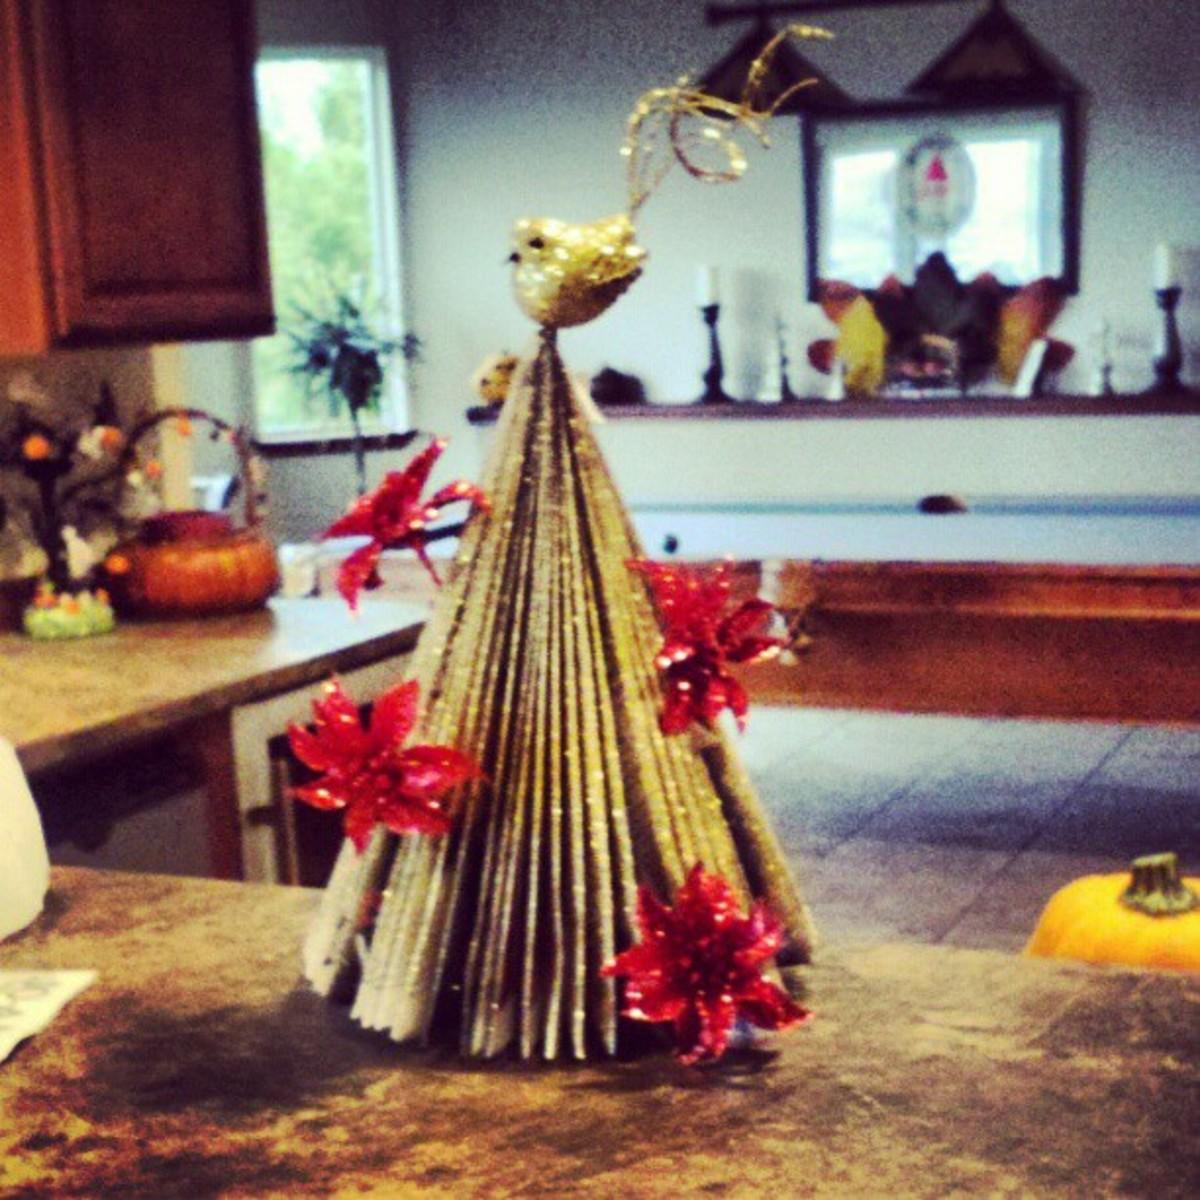 Christmas tree made with magazine